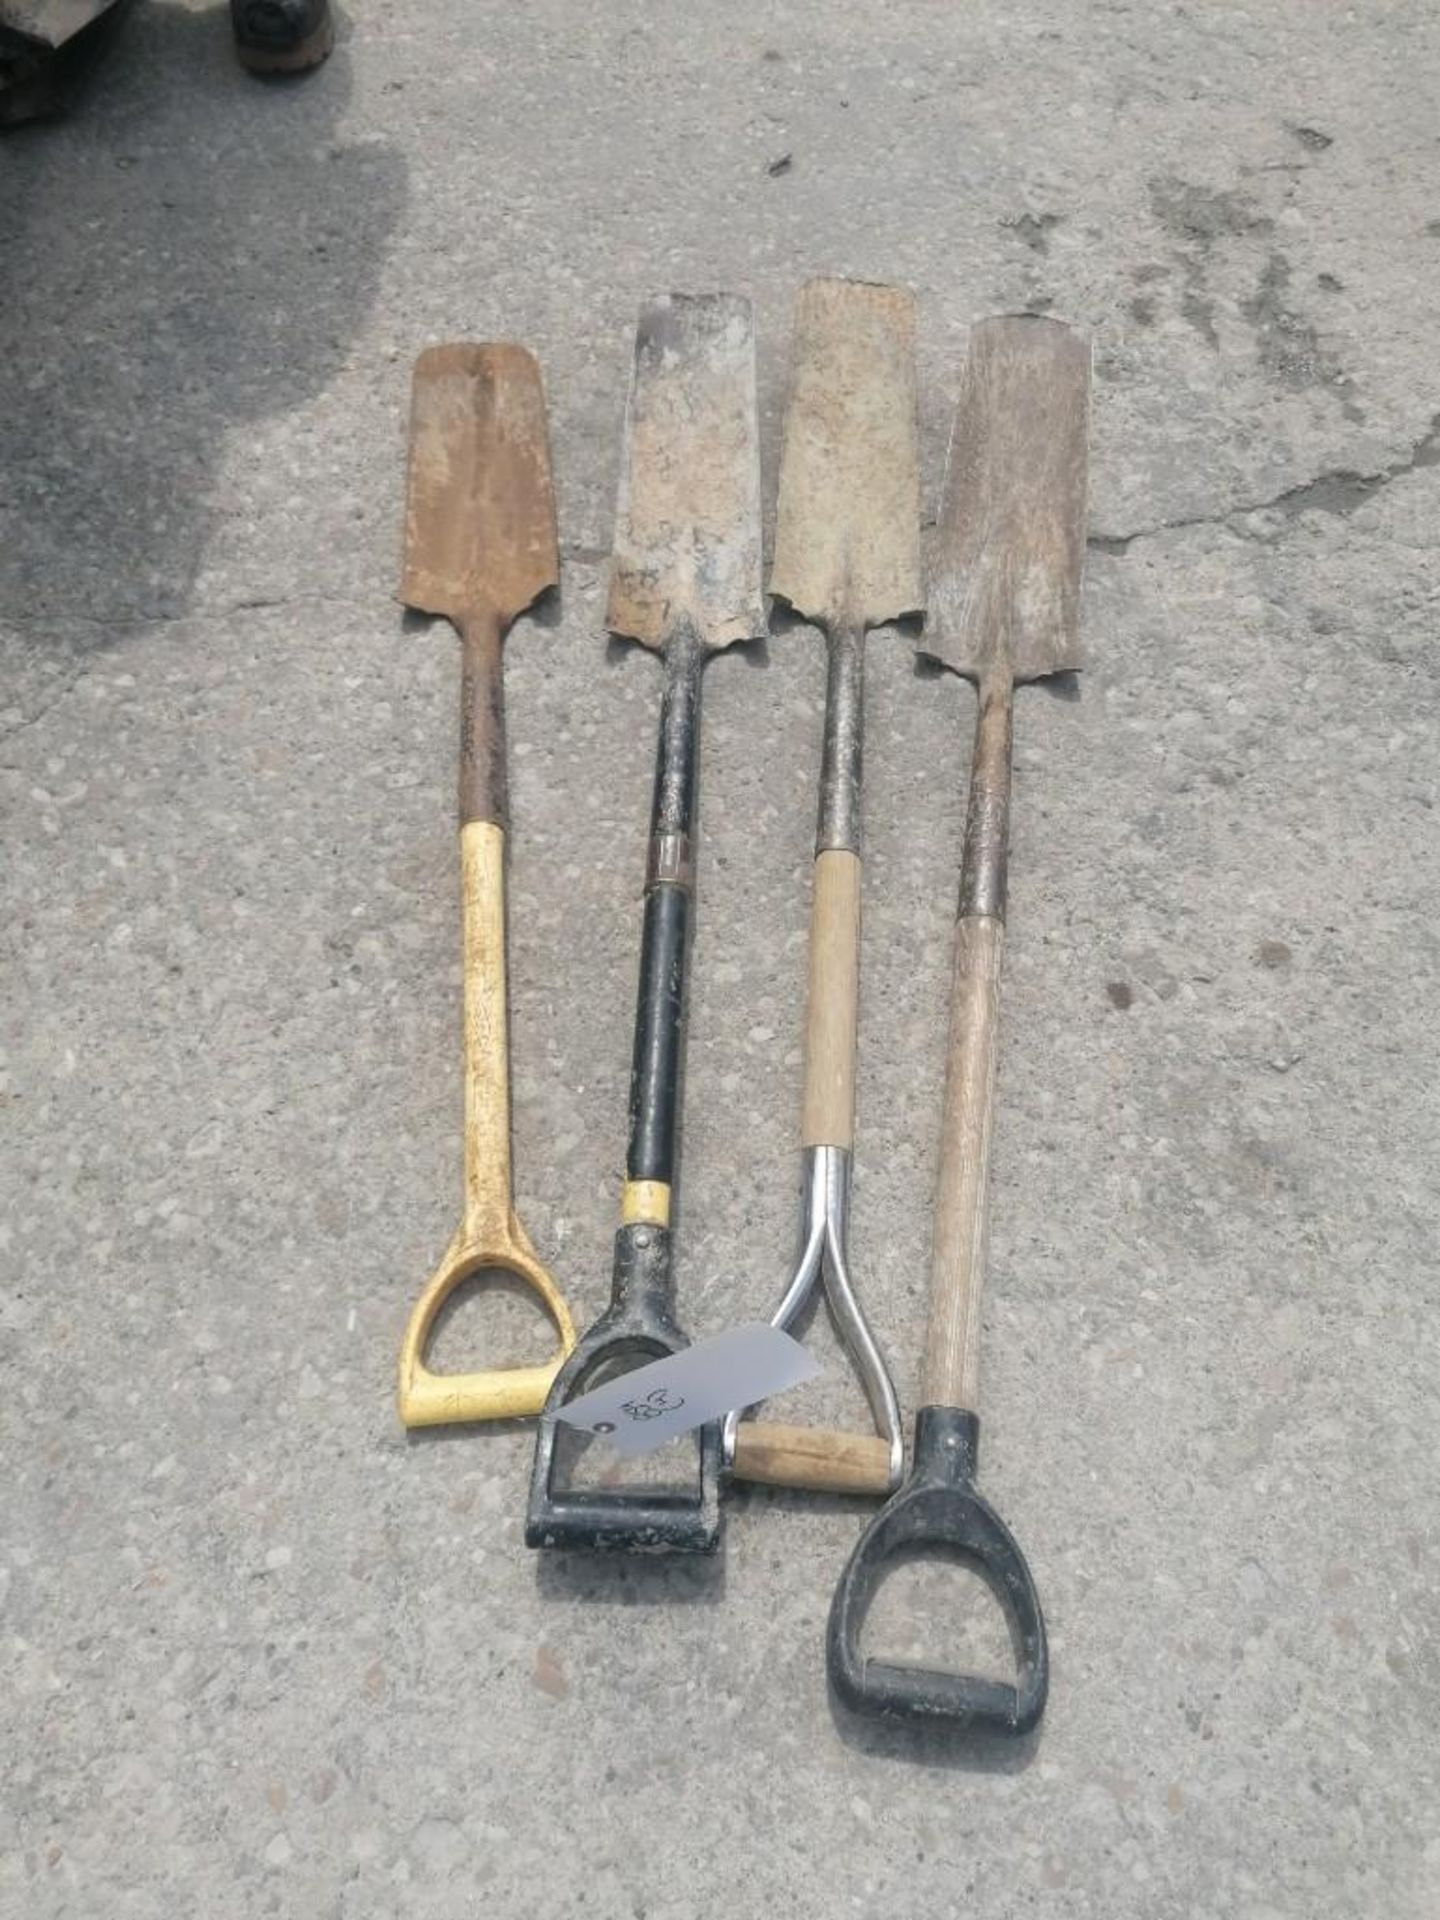 Lot 51 - (4) Shovels. Located at 301 E Henry Street, Mt. Pleasant, IA 52641.